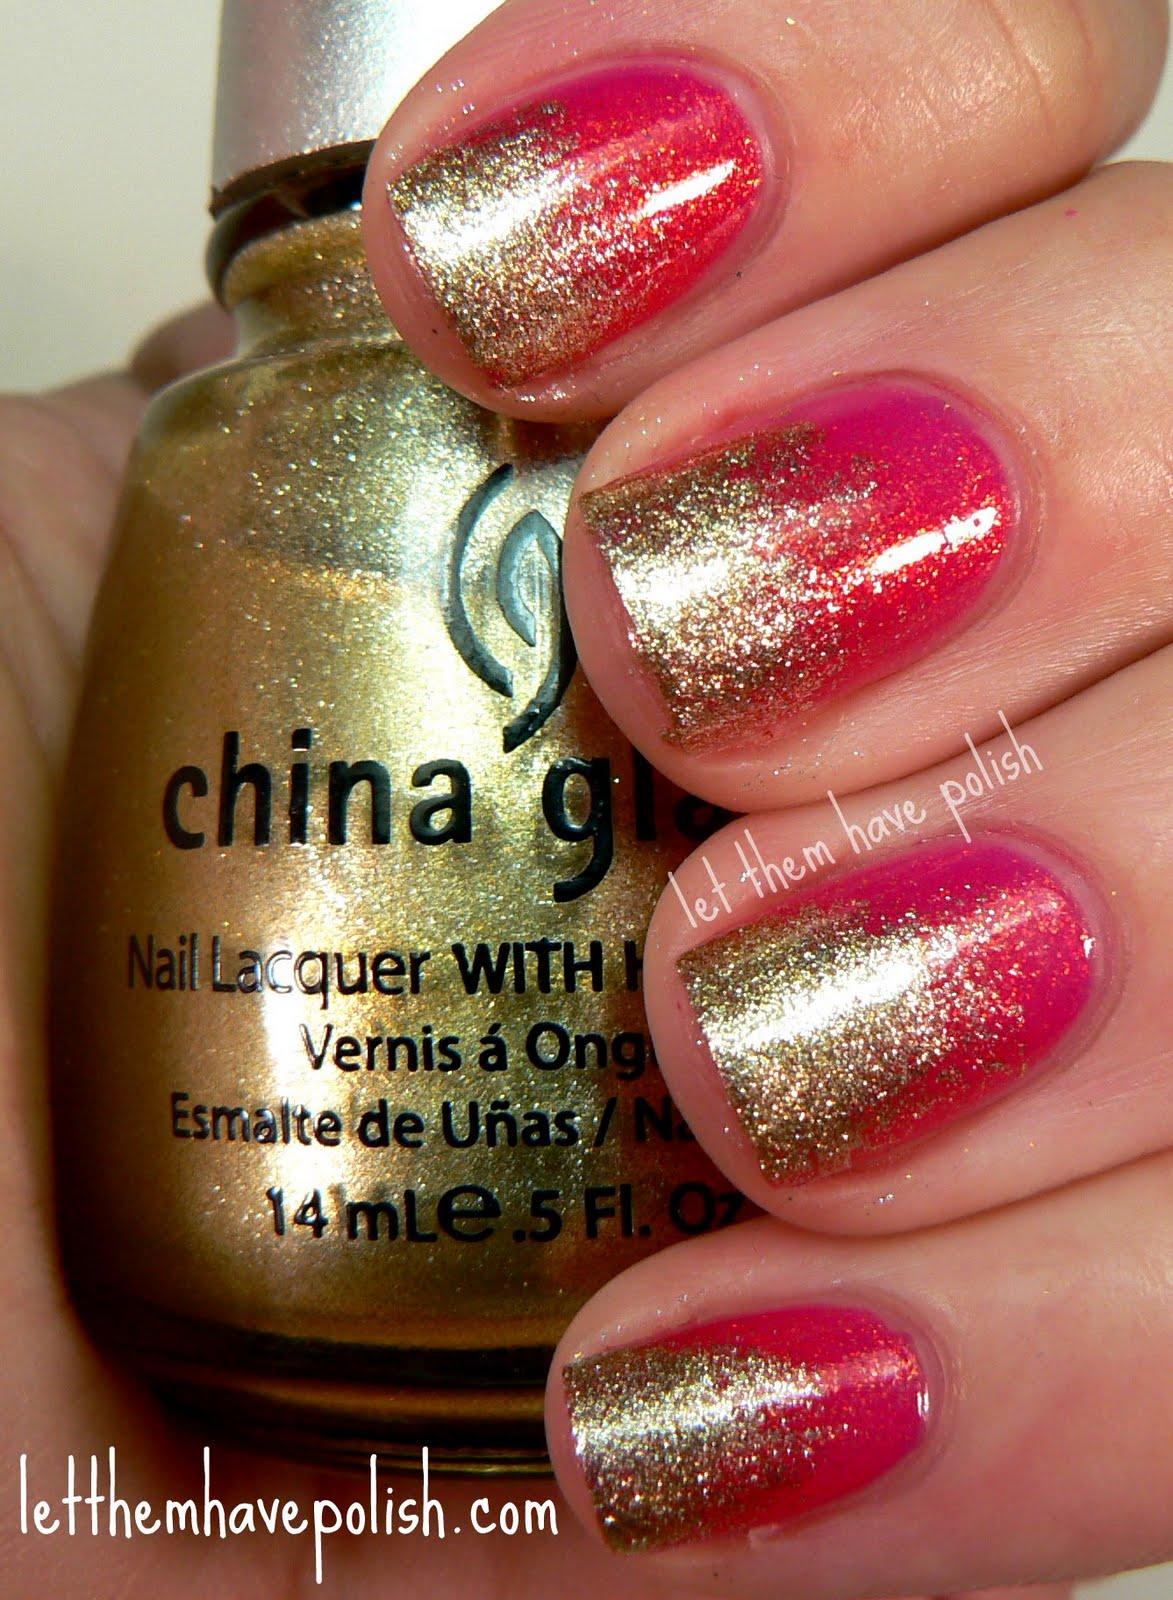 China Glaze Presenta Crakle Glaze: Let Them Have Polish!: Pink Wednesday!! China Glaze